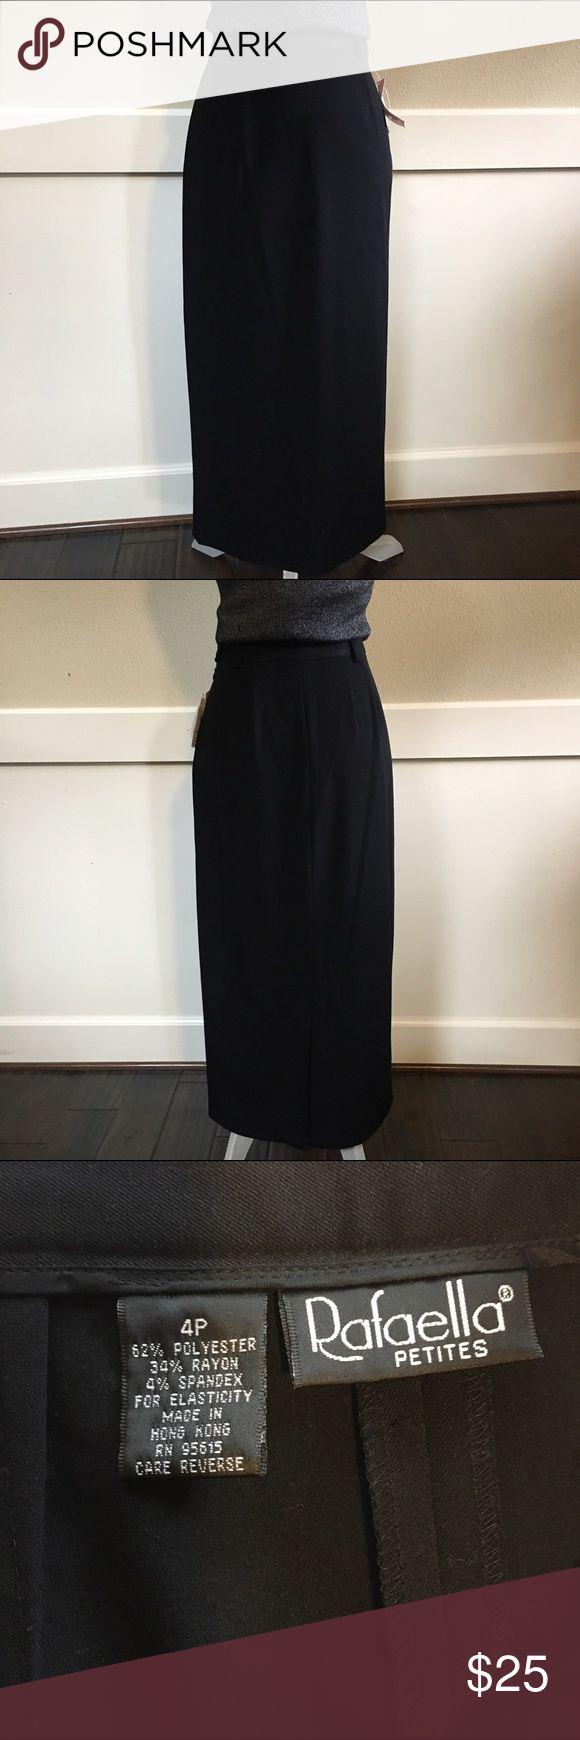 "Rafaella Black Maxi Skirt Black Maxi Skirt. Side Zip. Back Center 15"" slit. 62% Polyester 34% Rayon 4% Spandex. Size 4P. NWT Rafaella Skirts Maxi"